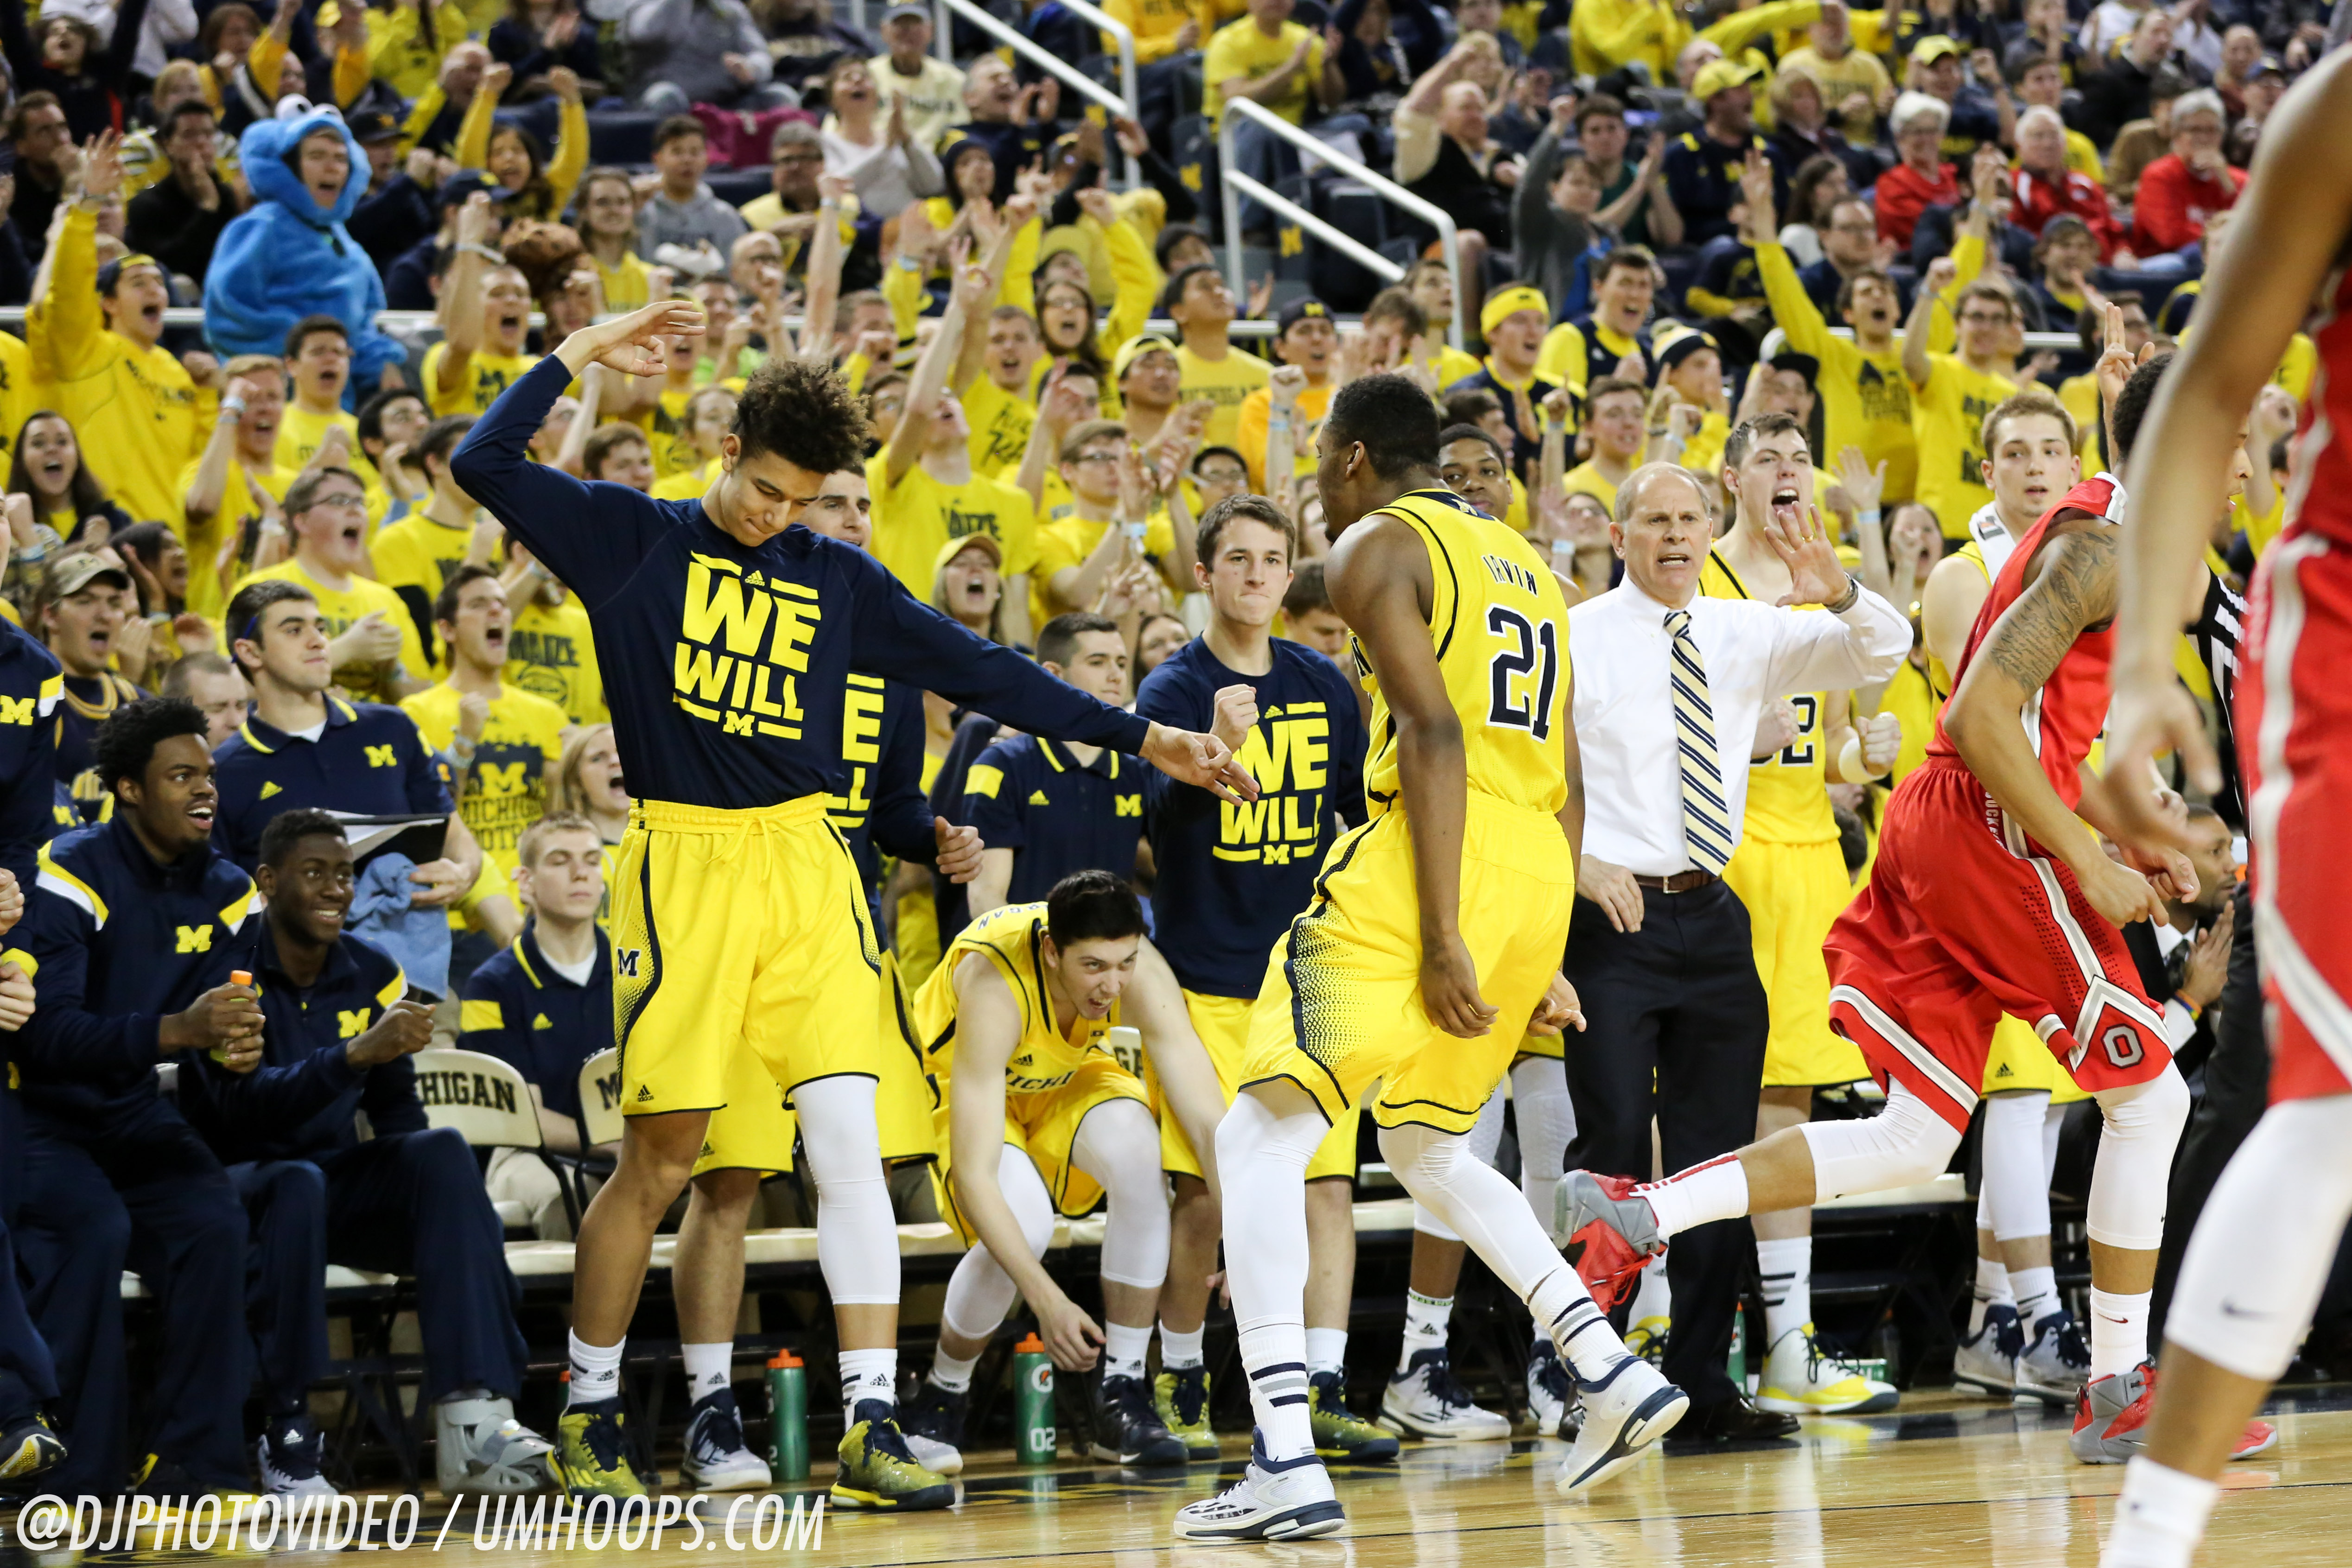 Michigan 64, Ohio State 57-22